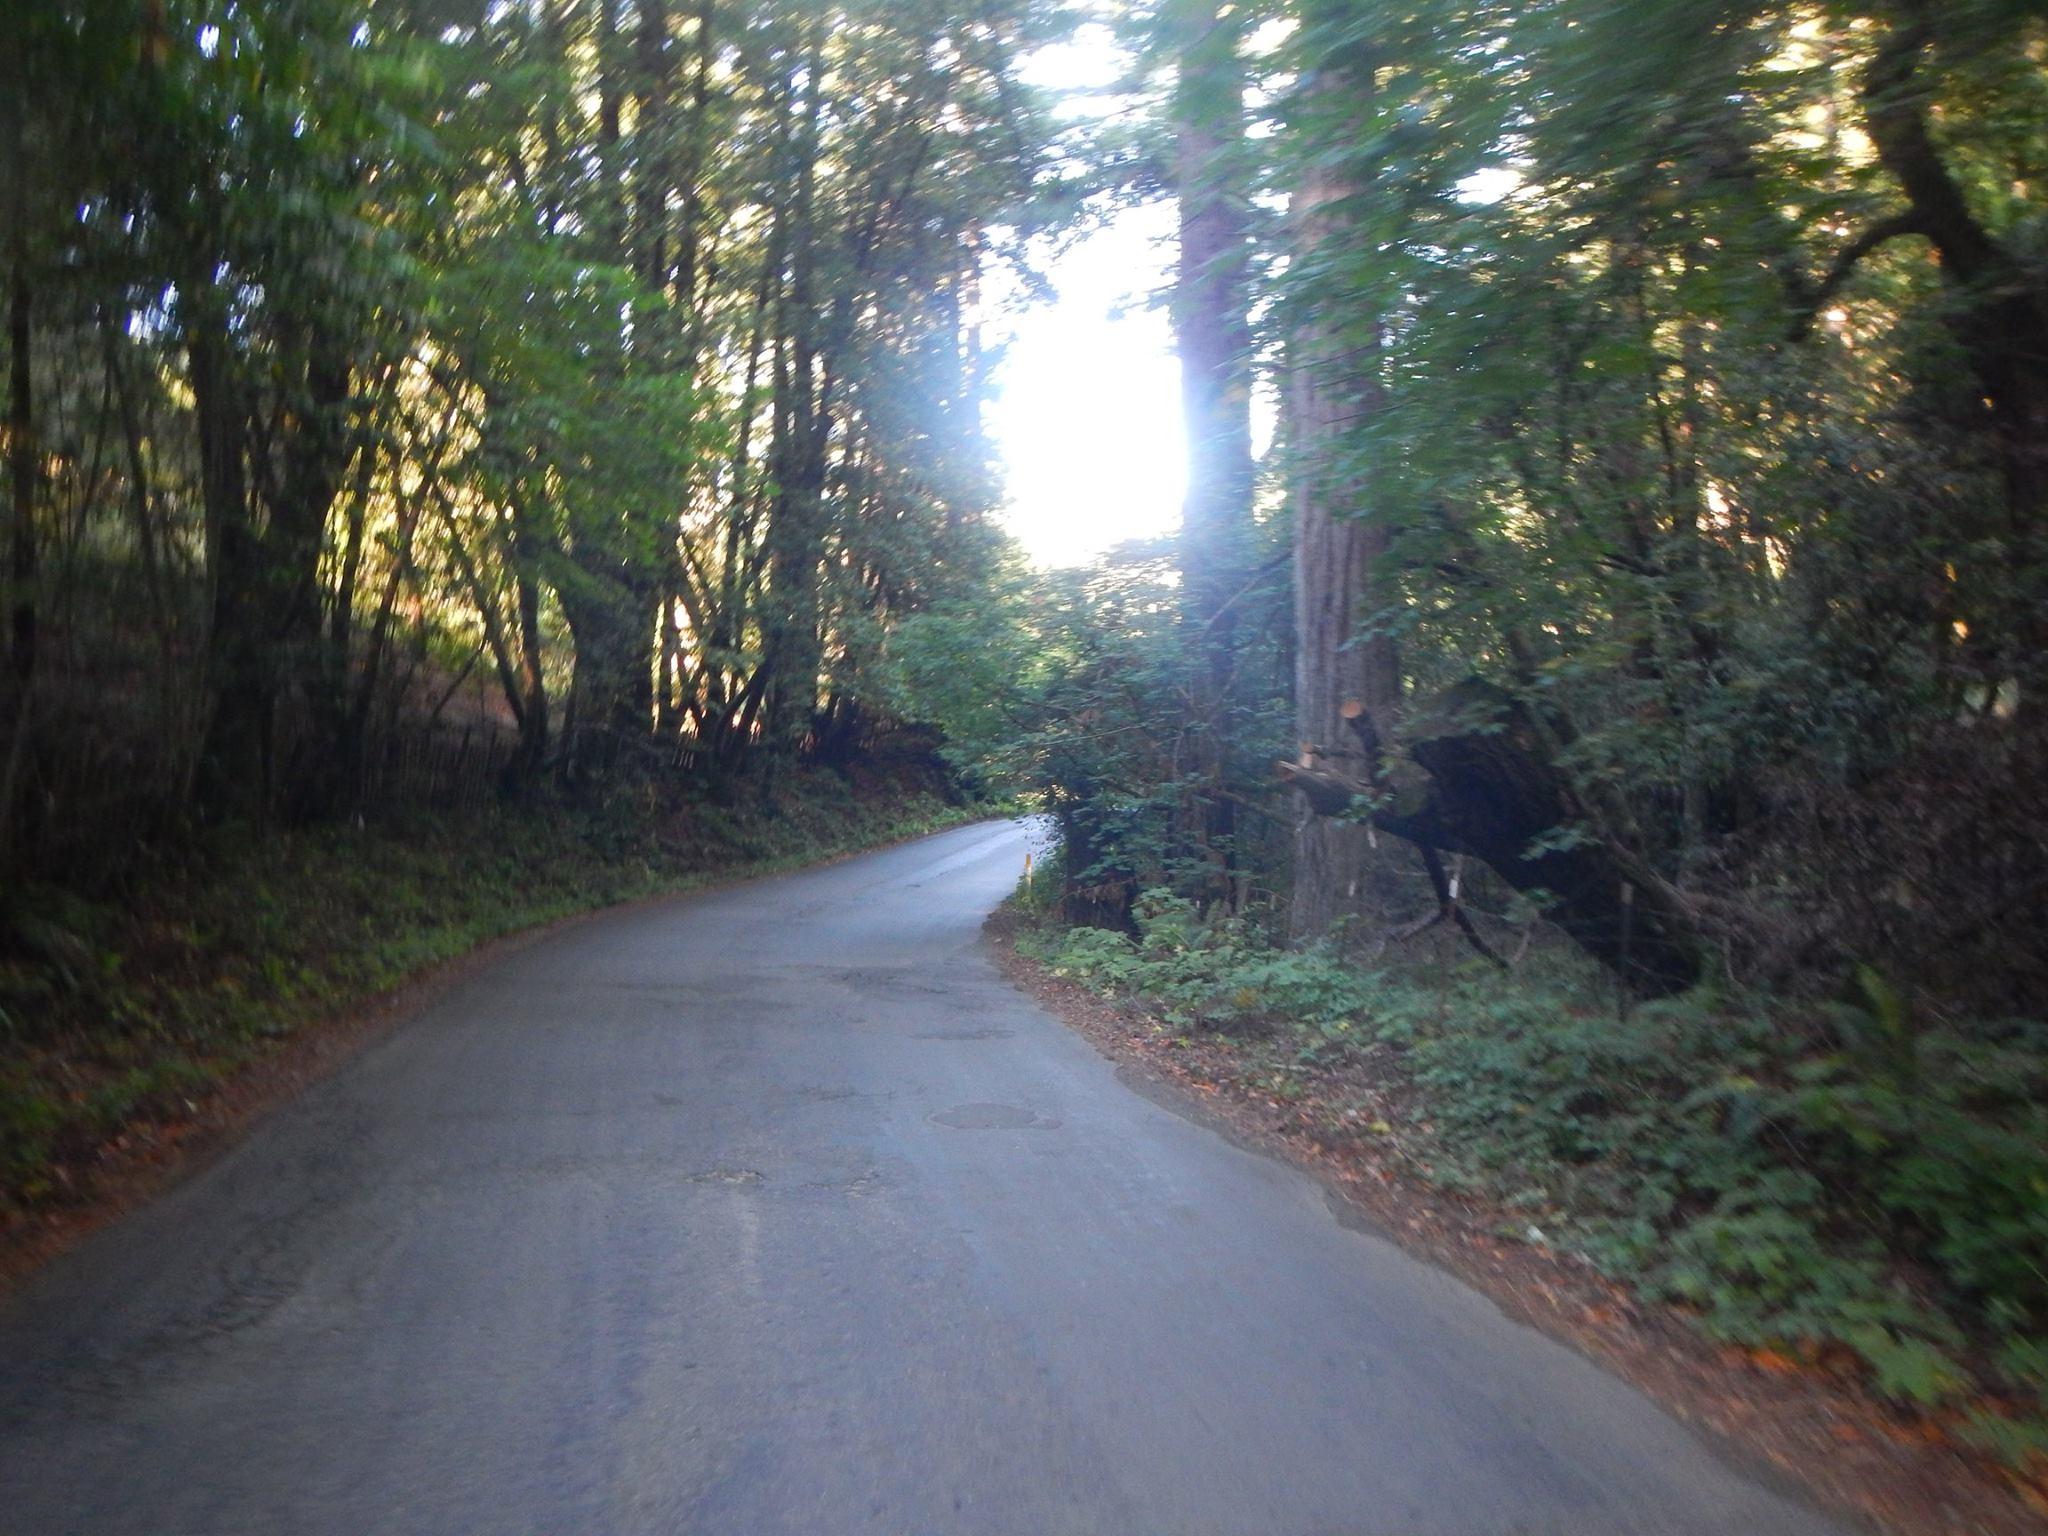 Exploring roads in California.